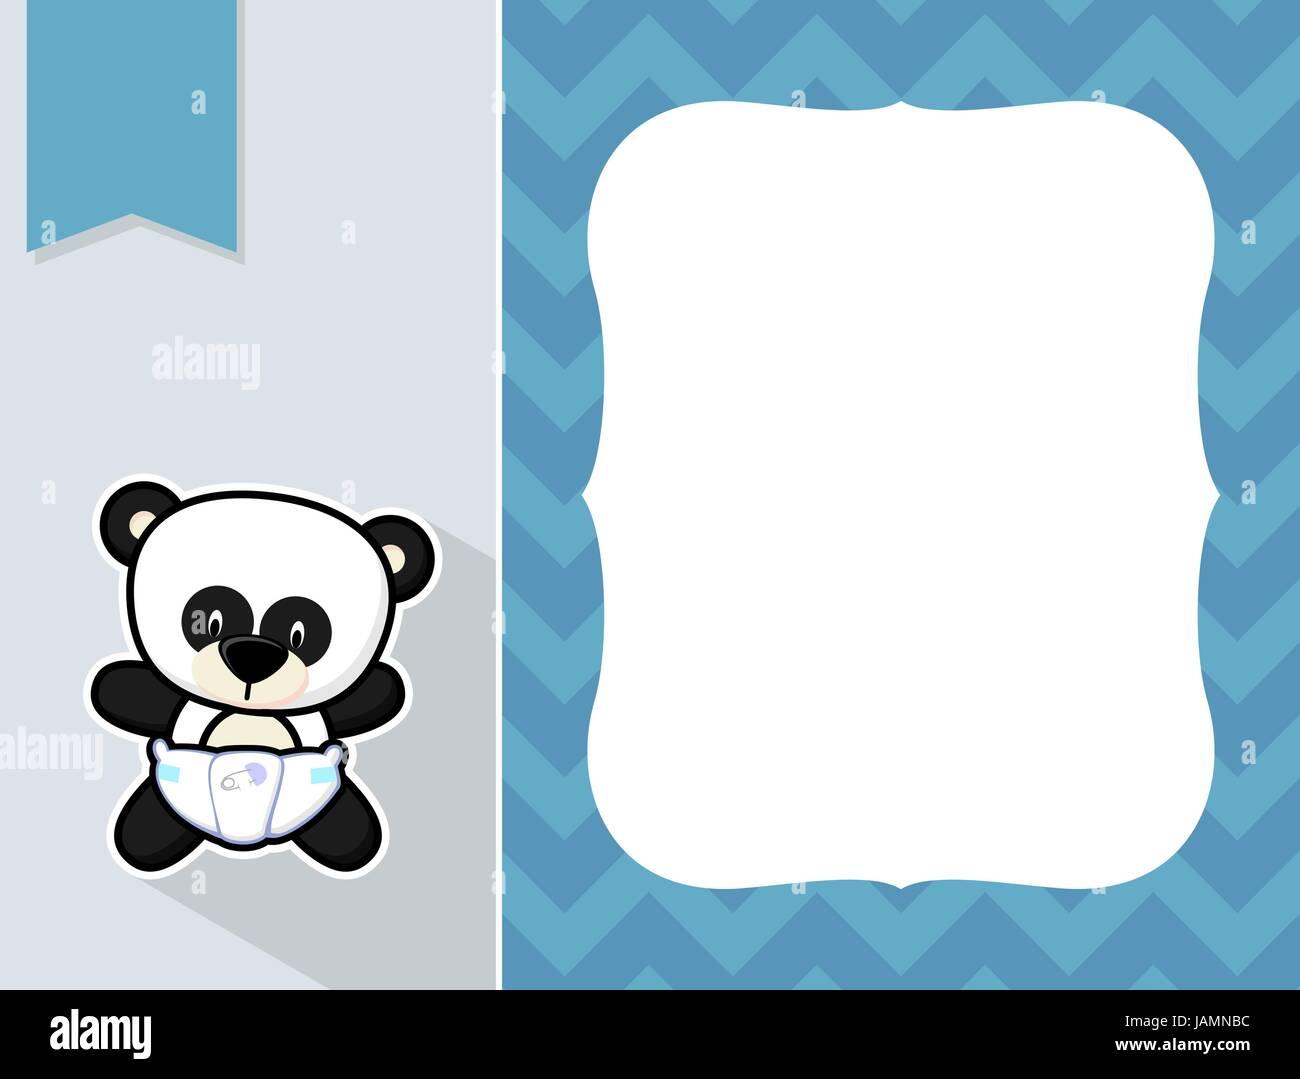 panda clip art stockfotos panda clip art bilder alamy. Black Bedroom Furniture Sets. Home Design Ideas